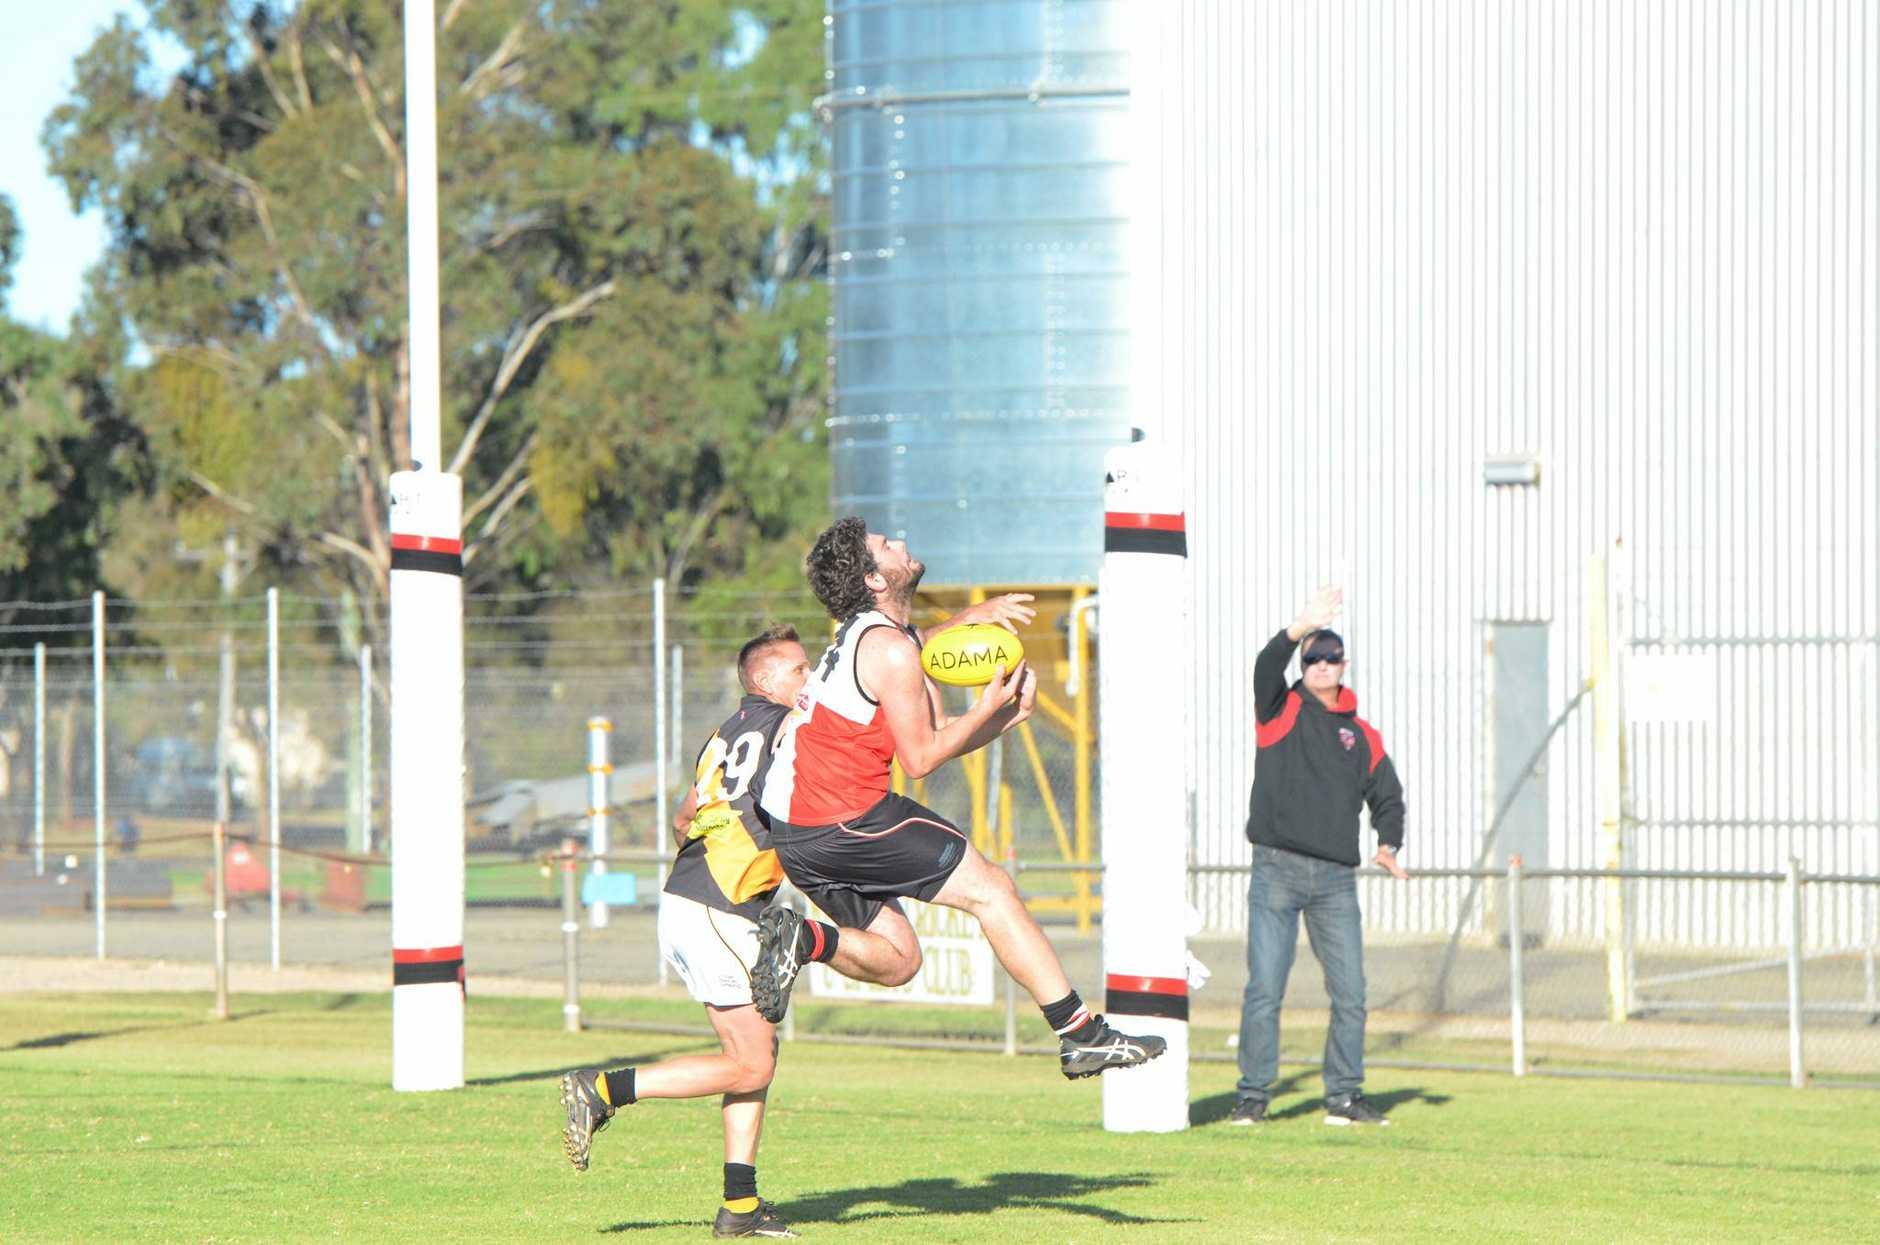 Jordan Pressnell takes a mark running back toward goal.